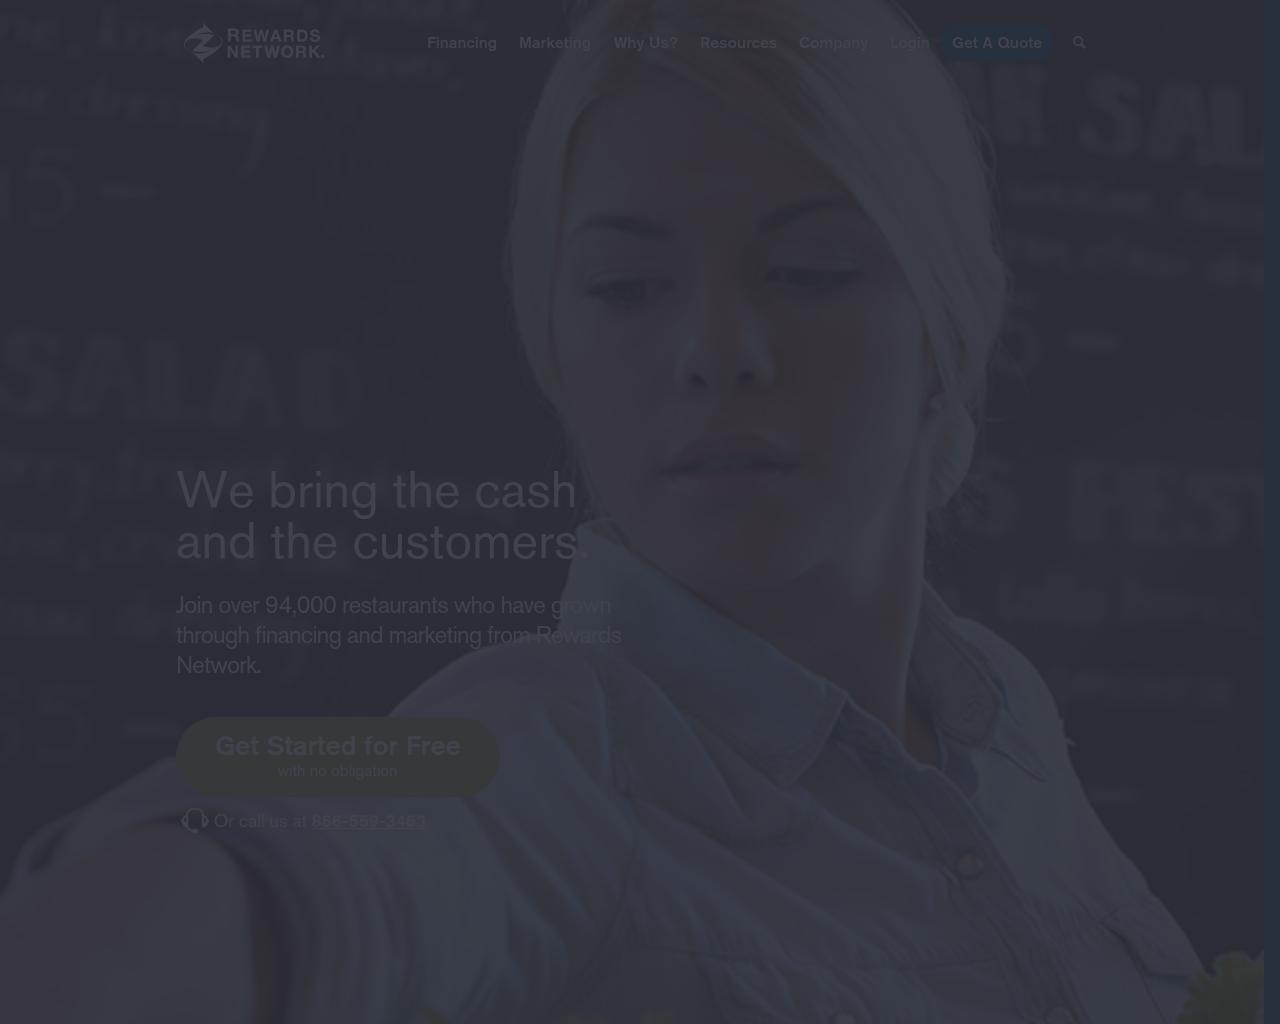 REWARDS-NETWORK.-Advertising-Reviews-Pricing